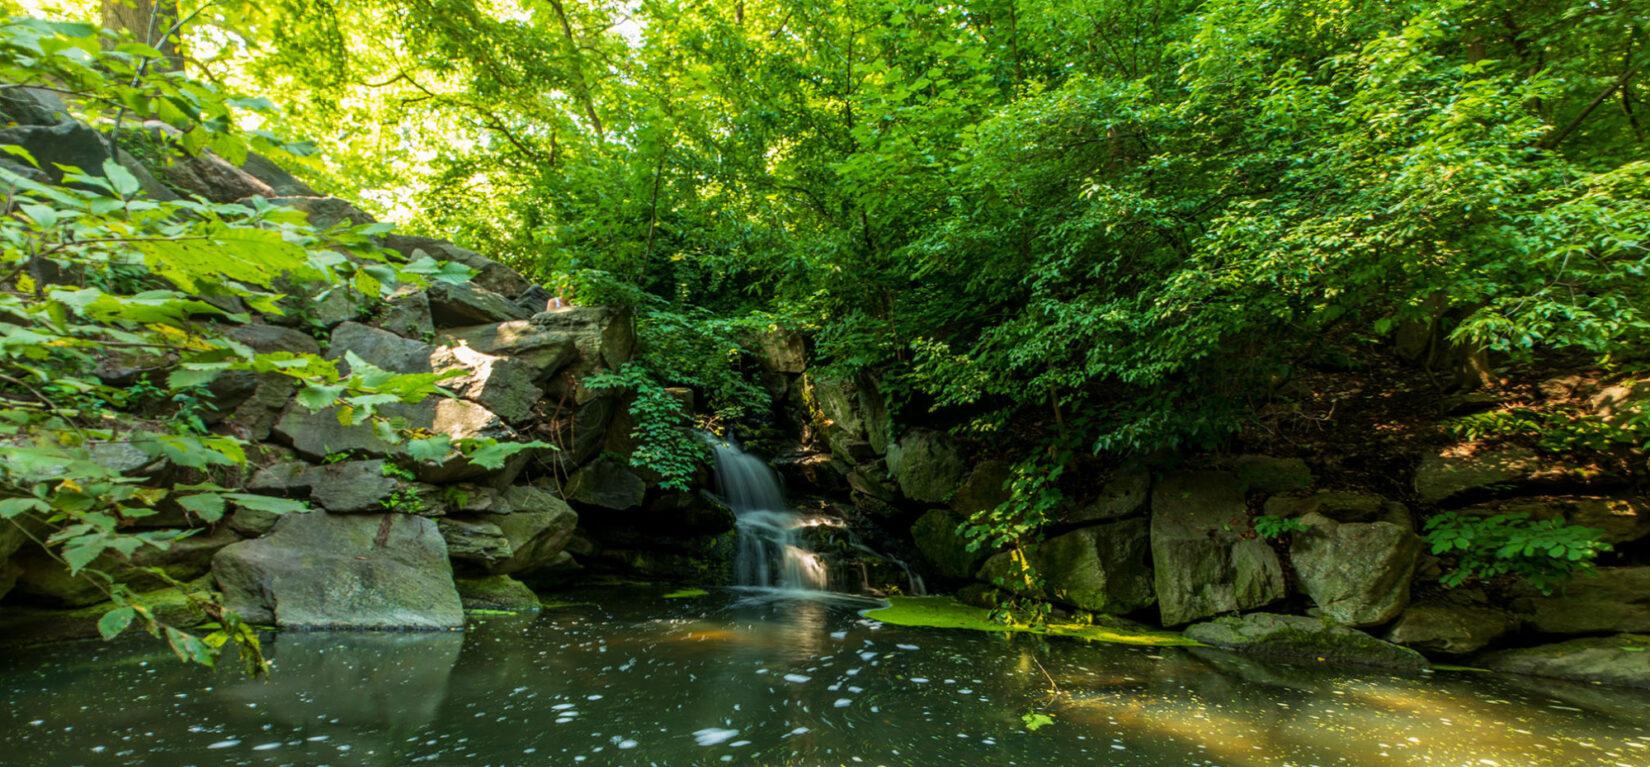 Improving Central Park in 2017